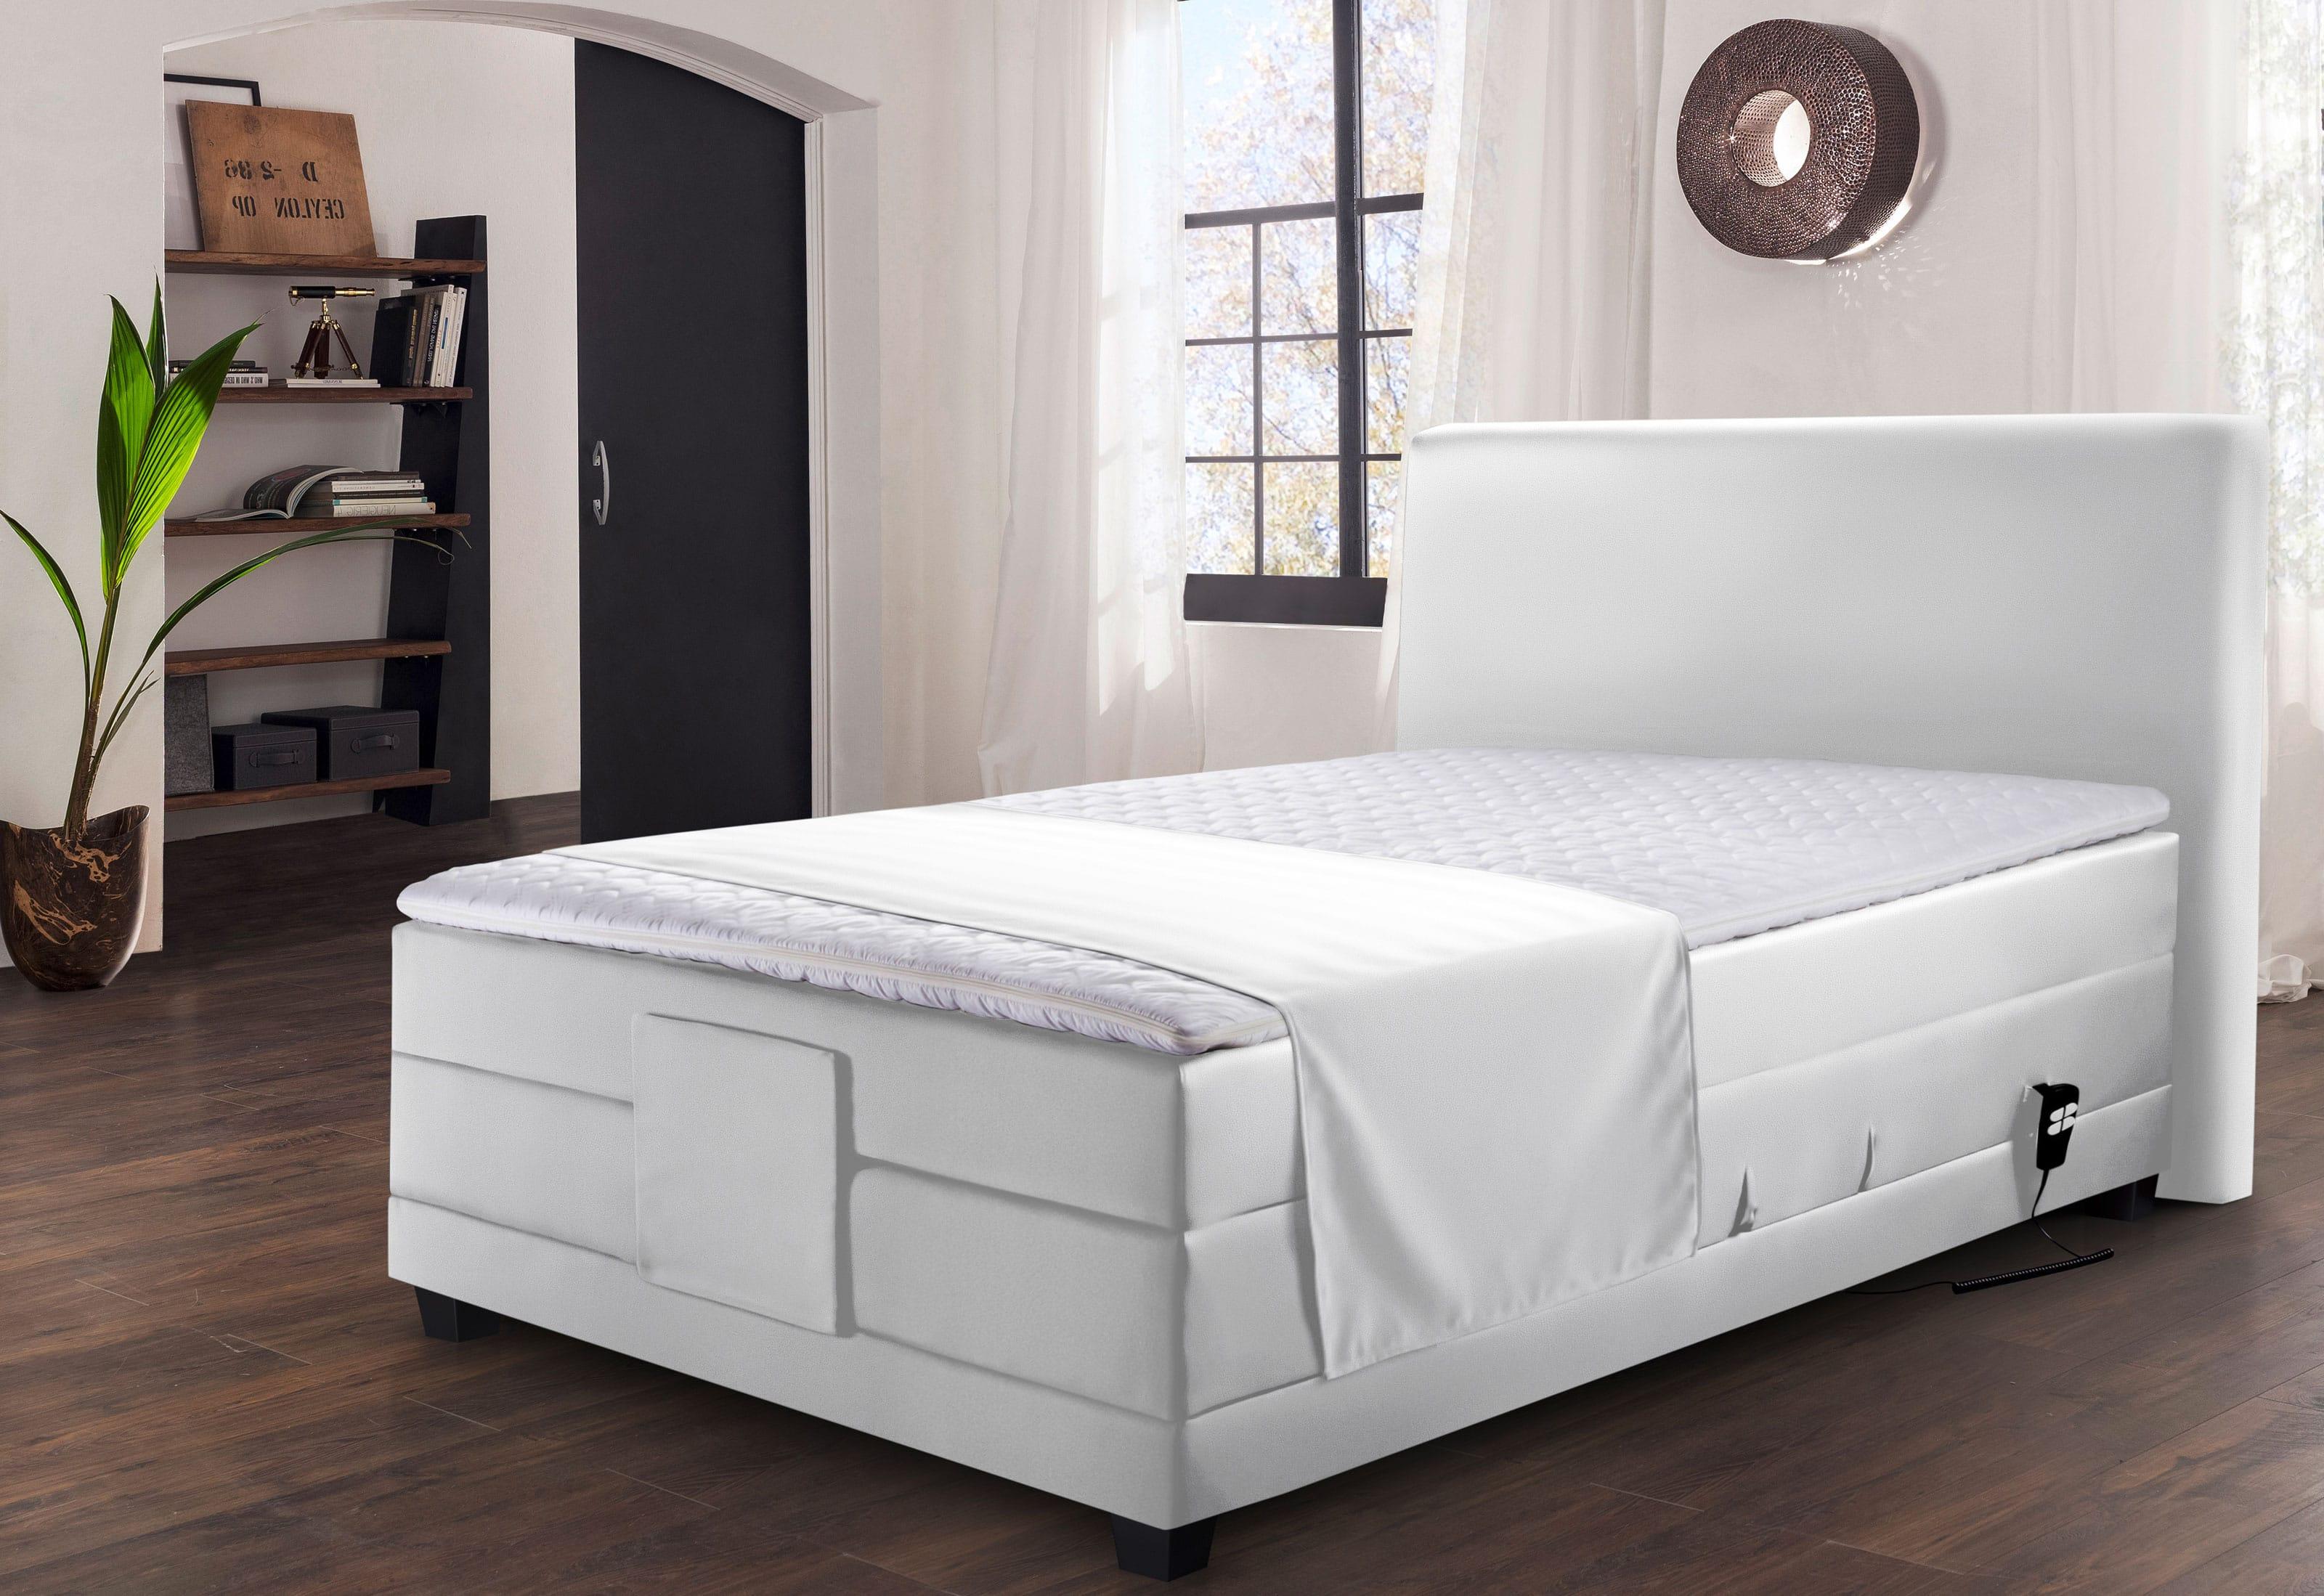 winkle madrid elektrisch verstellbares boxspringbett. Black Bedroom Furniture Sets. Home Design Ideas